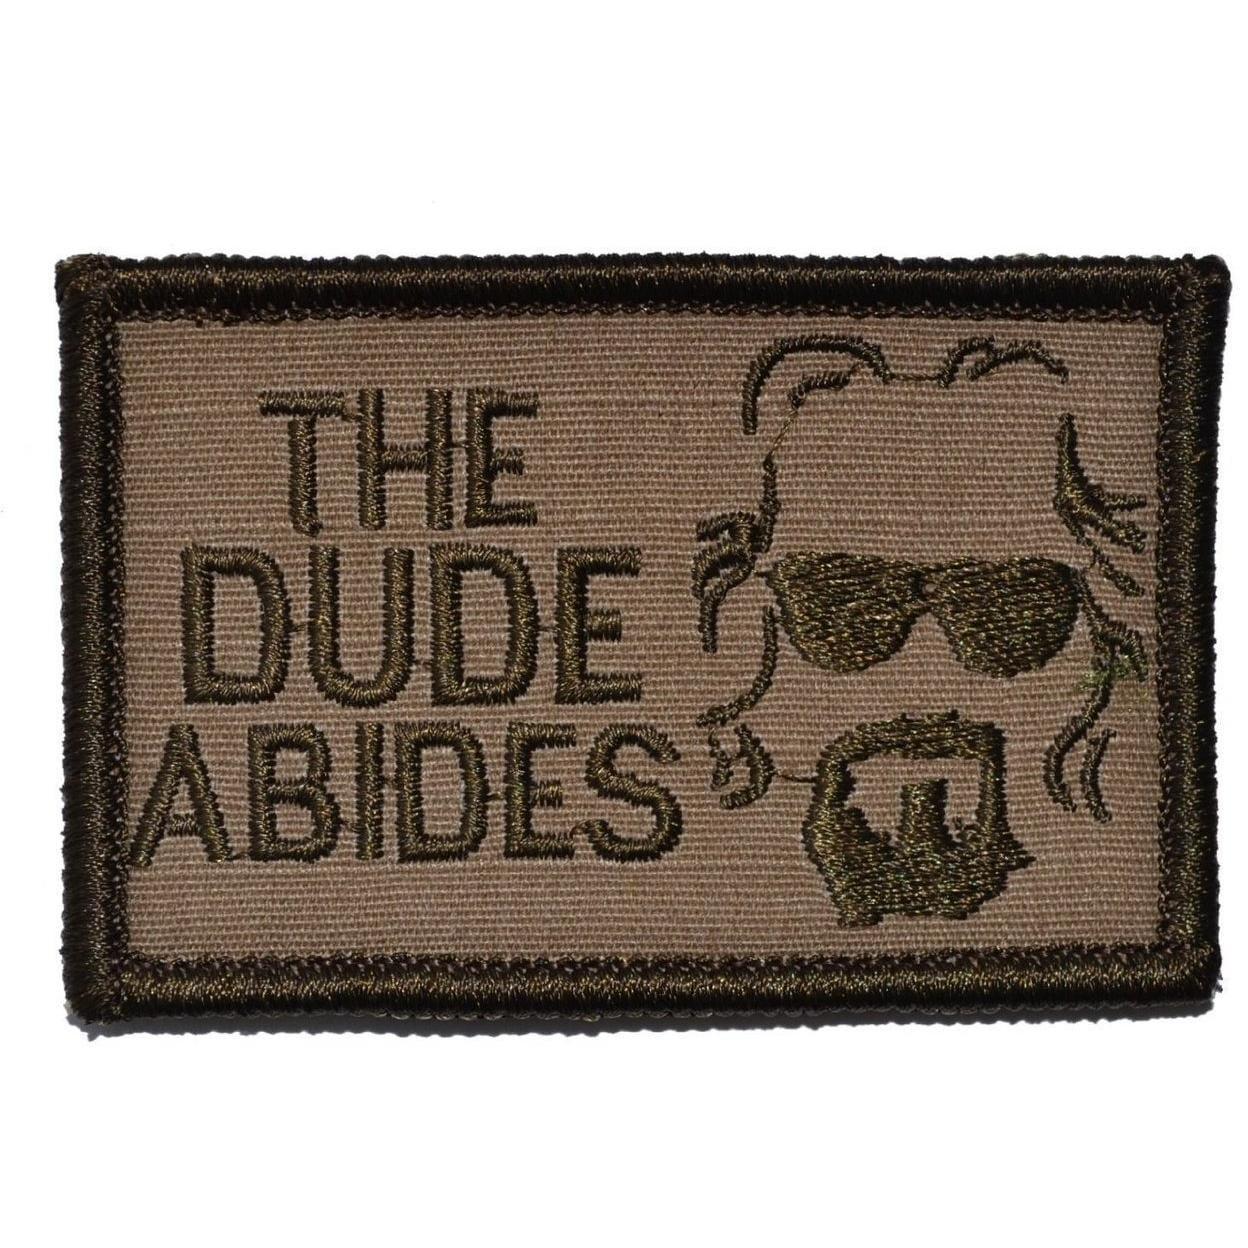 The Dude Abides, The Big Lebowski - 2x3 Patch